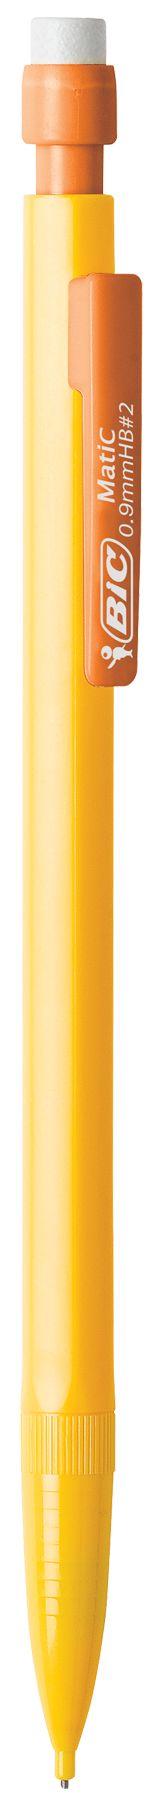 BIC Mechanical Pencil with Metallic Barrels, 0.5mm, Black, 24-Pack - Walmart.com